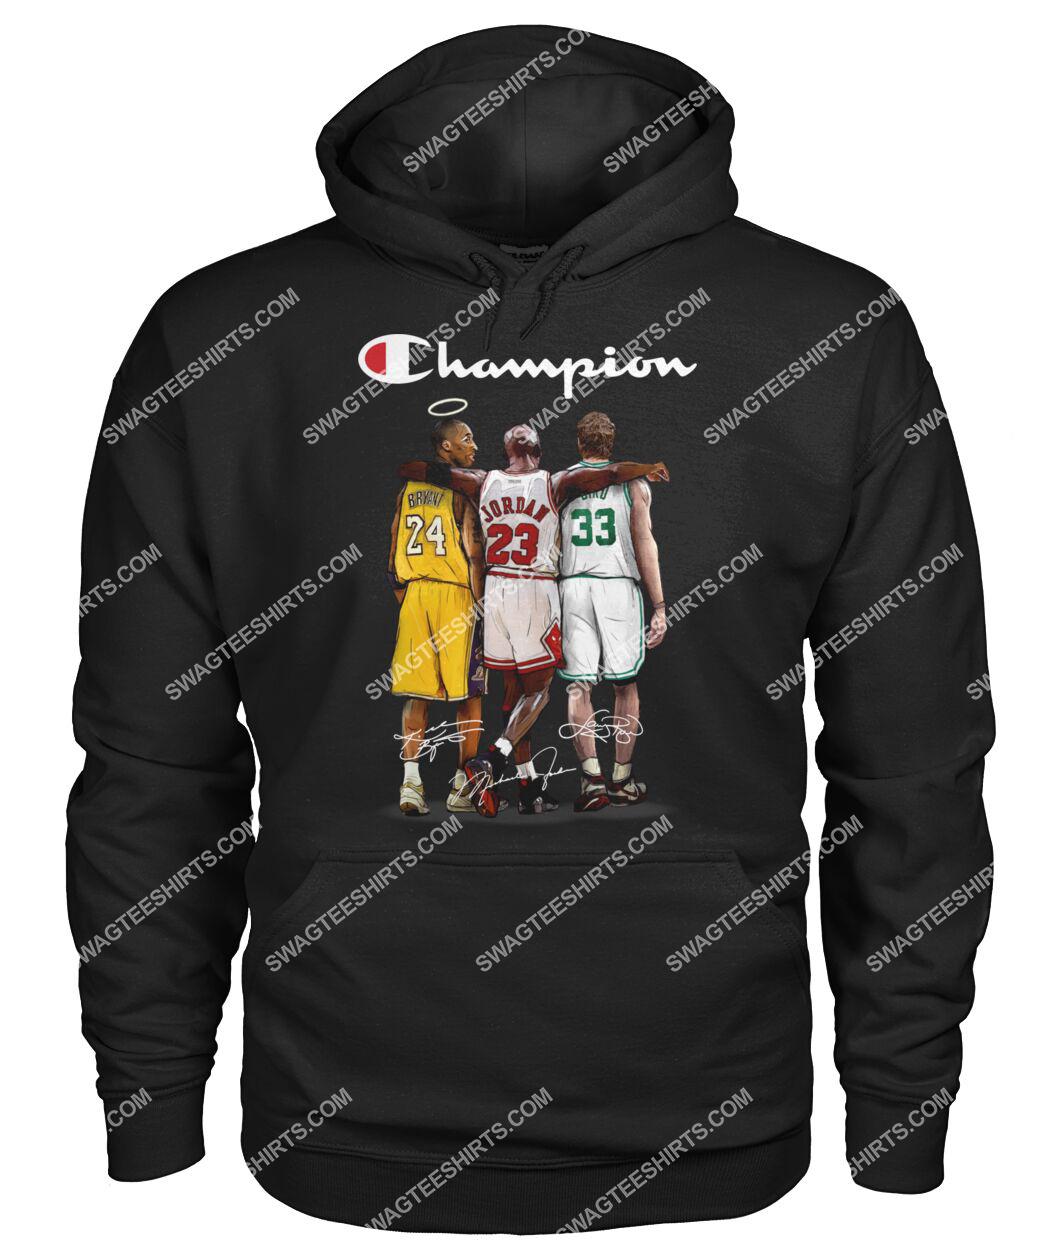 champion kobe bryant michael jordan and larry bird hoodie 1